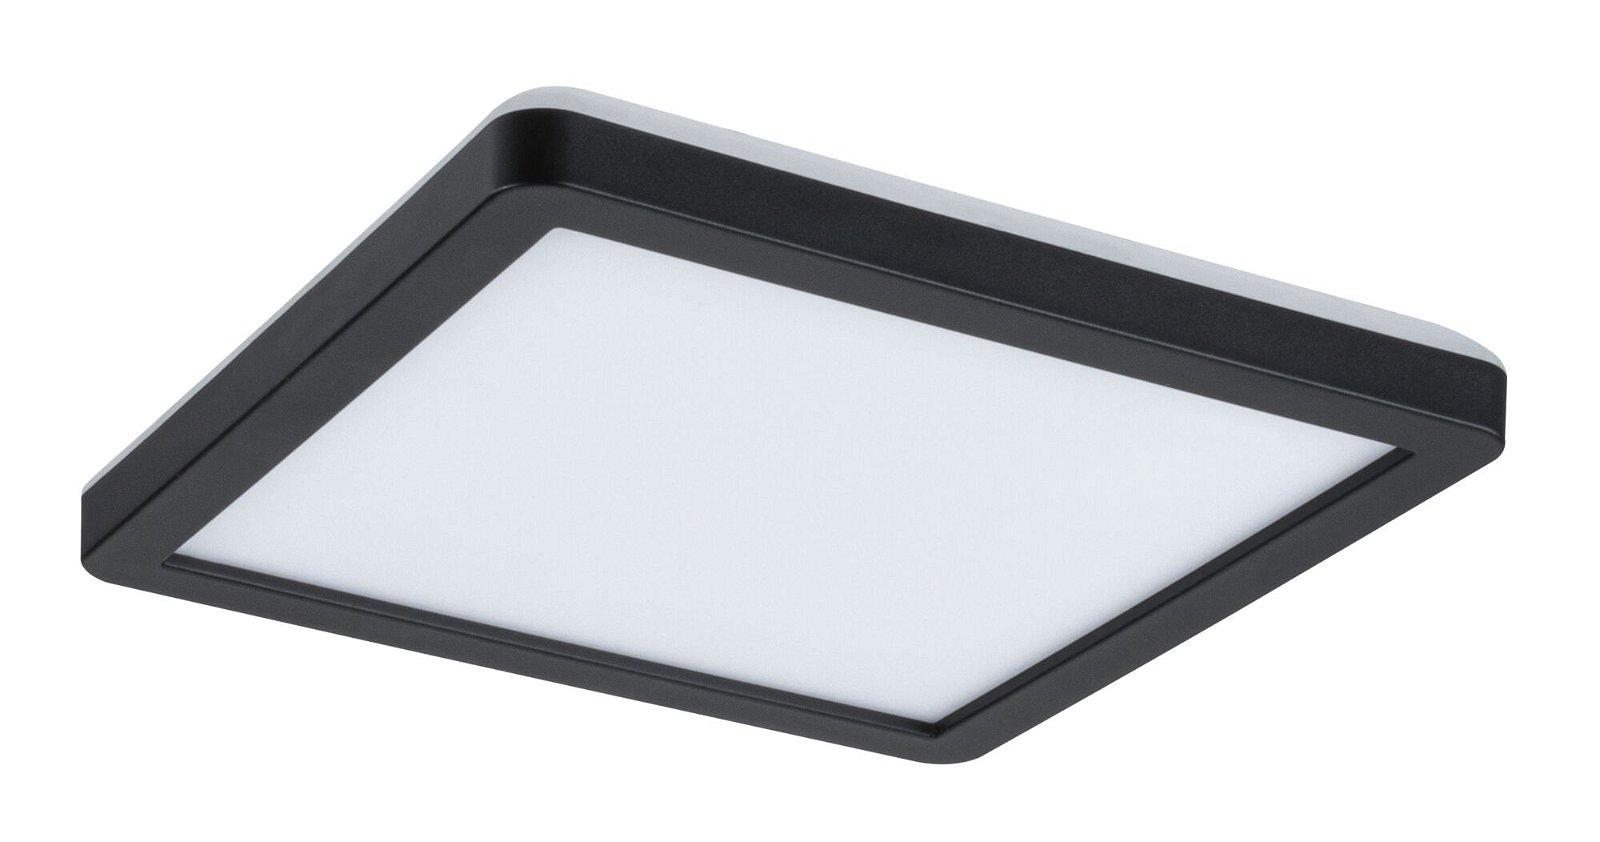 LED Panel Atria Shine eckig 190x190mm 1360lm 4000K Schwarz